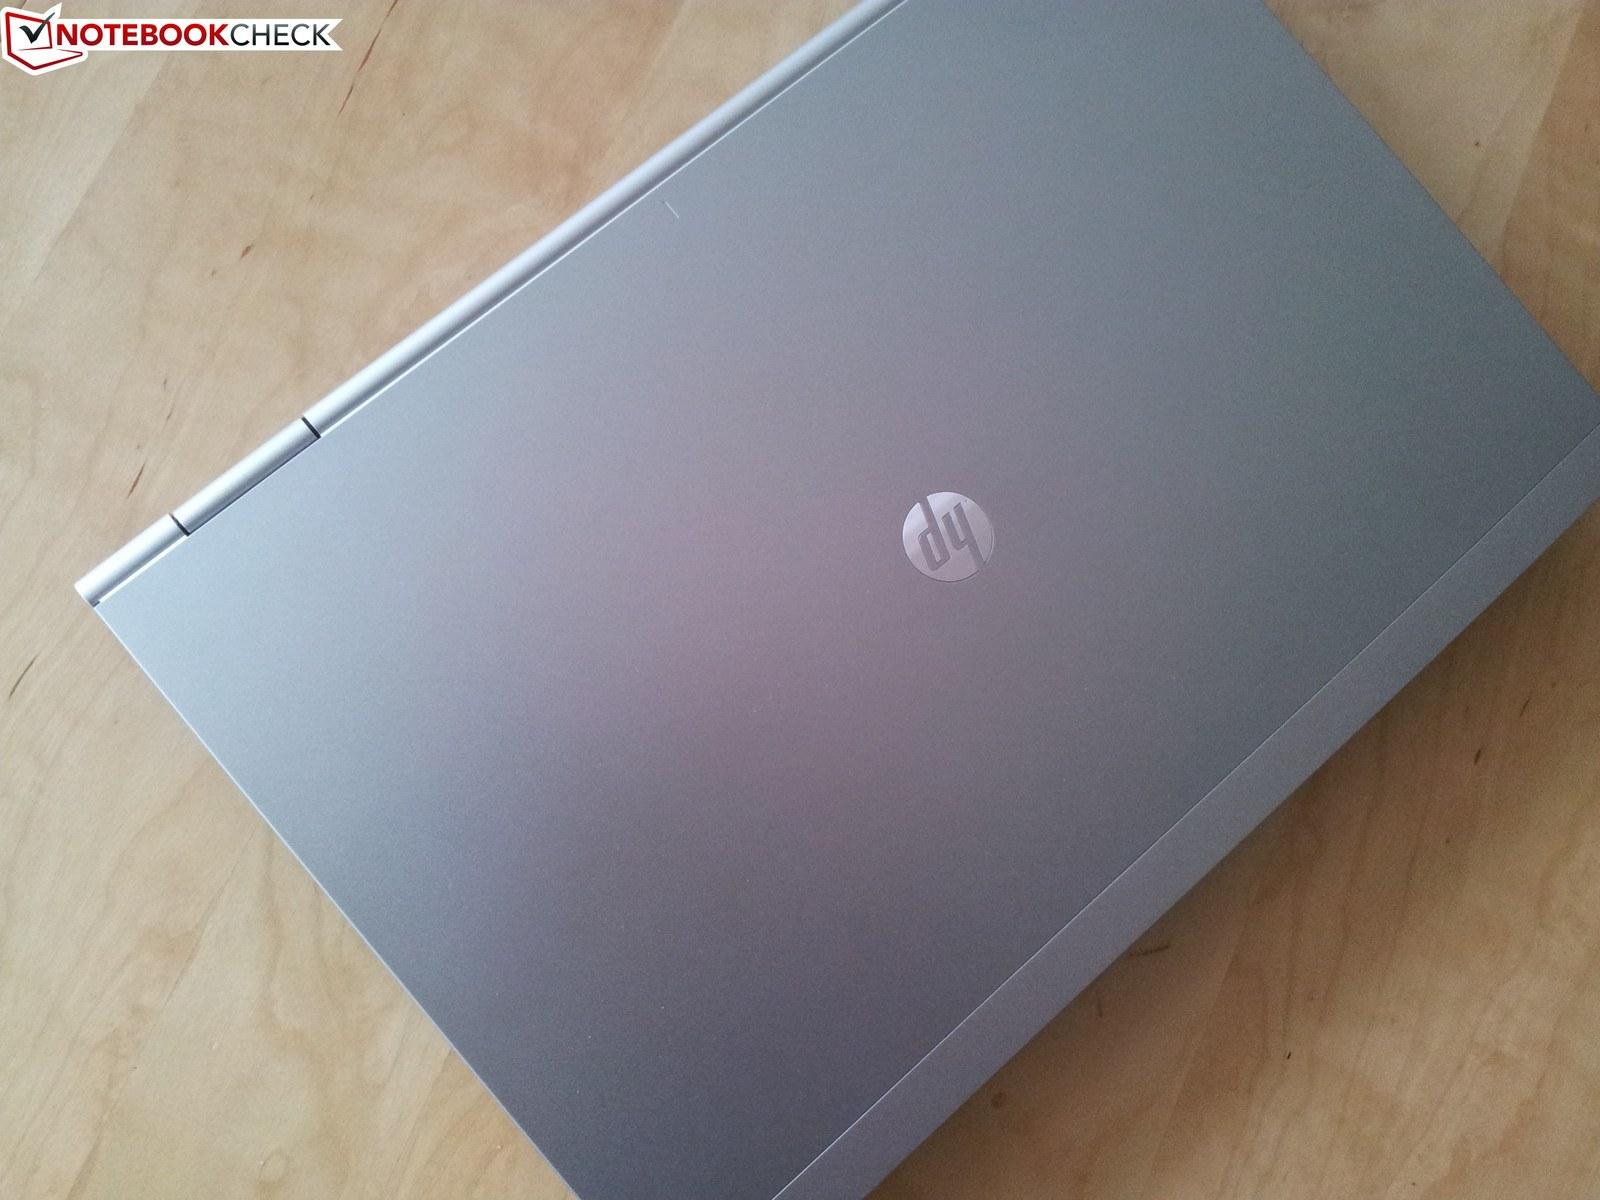 HP Elitebook 8470p - Core i5 - Thế hệ 3